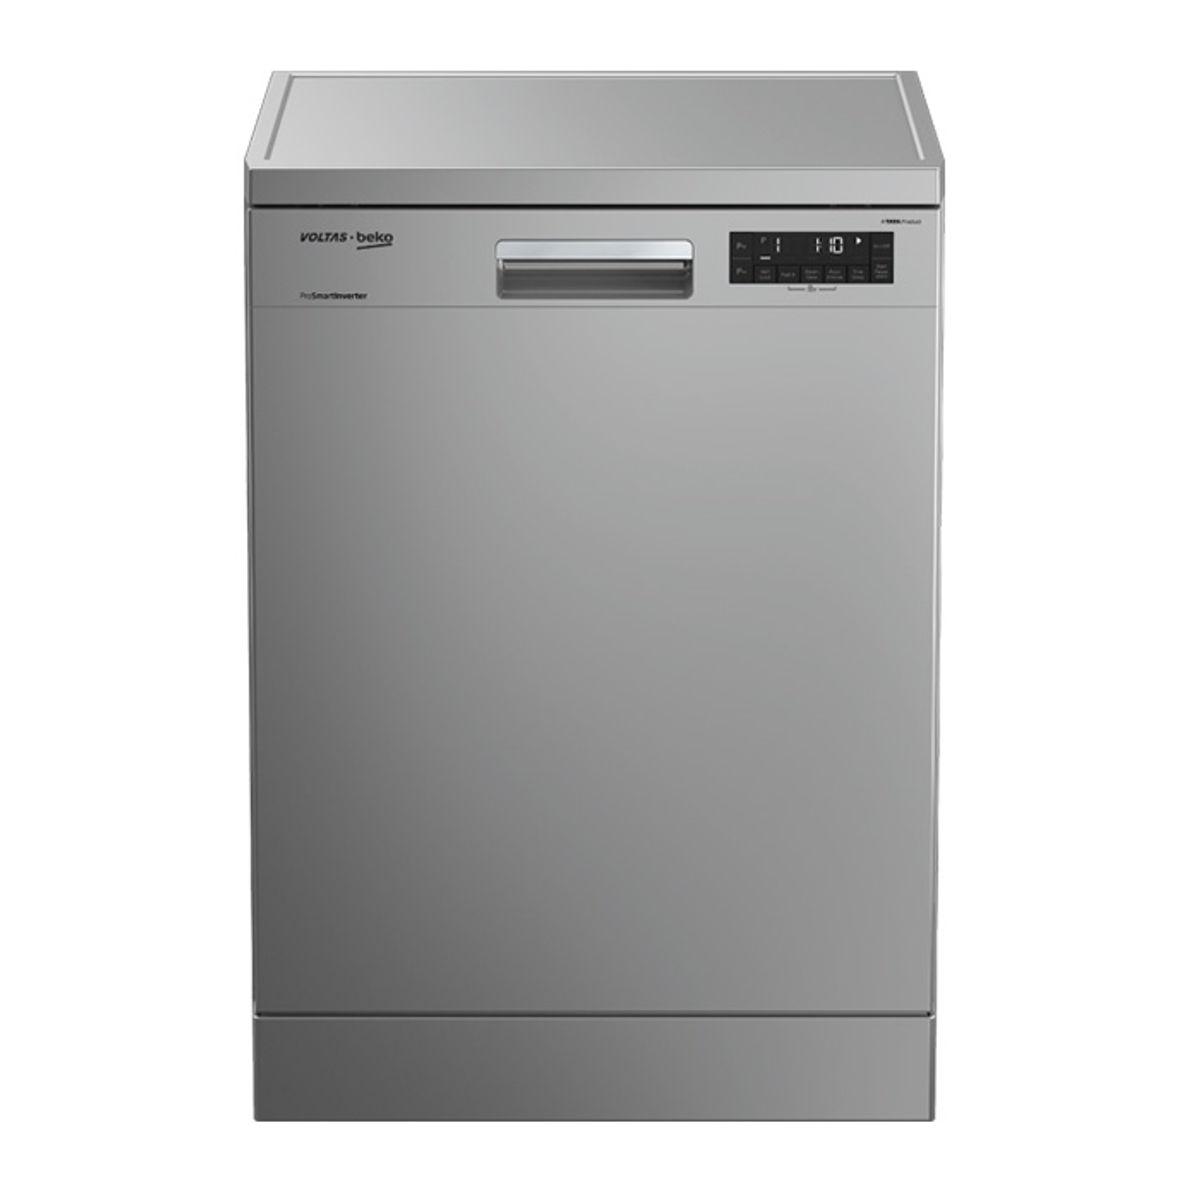 वोल्टास DF14S2 Dishwasher